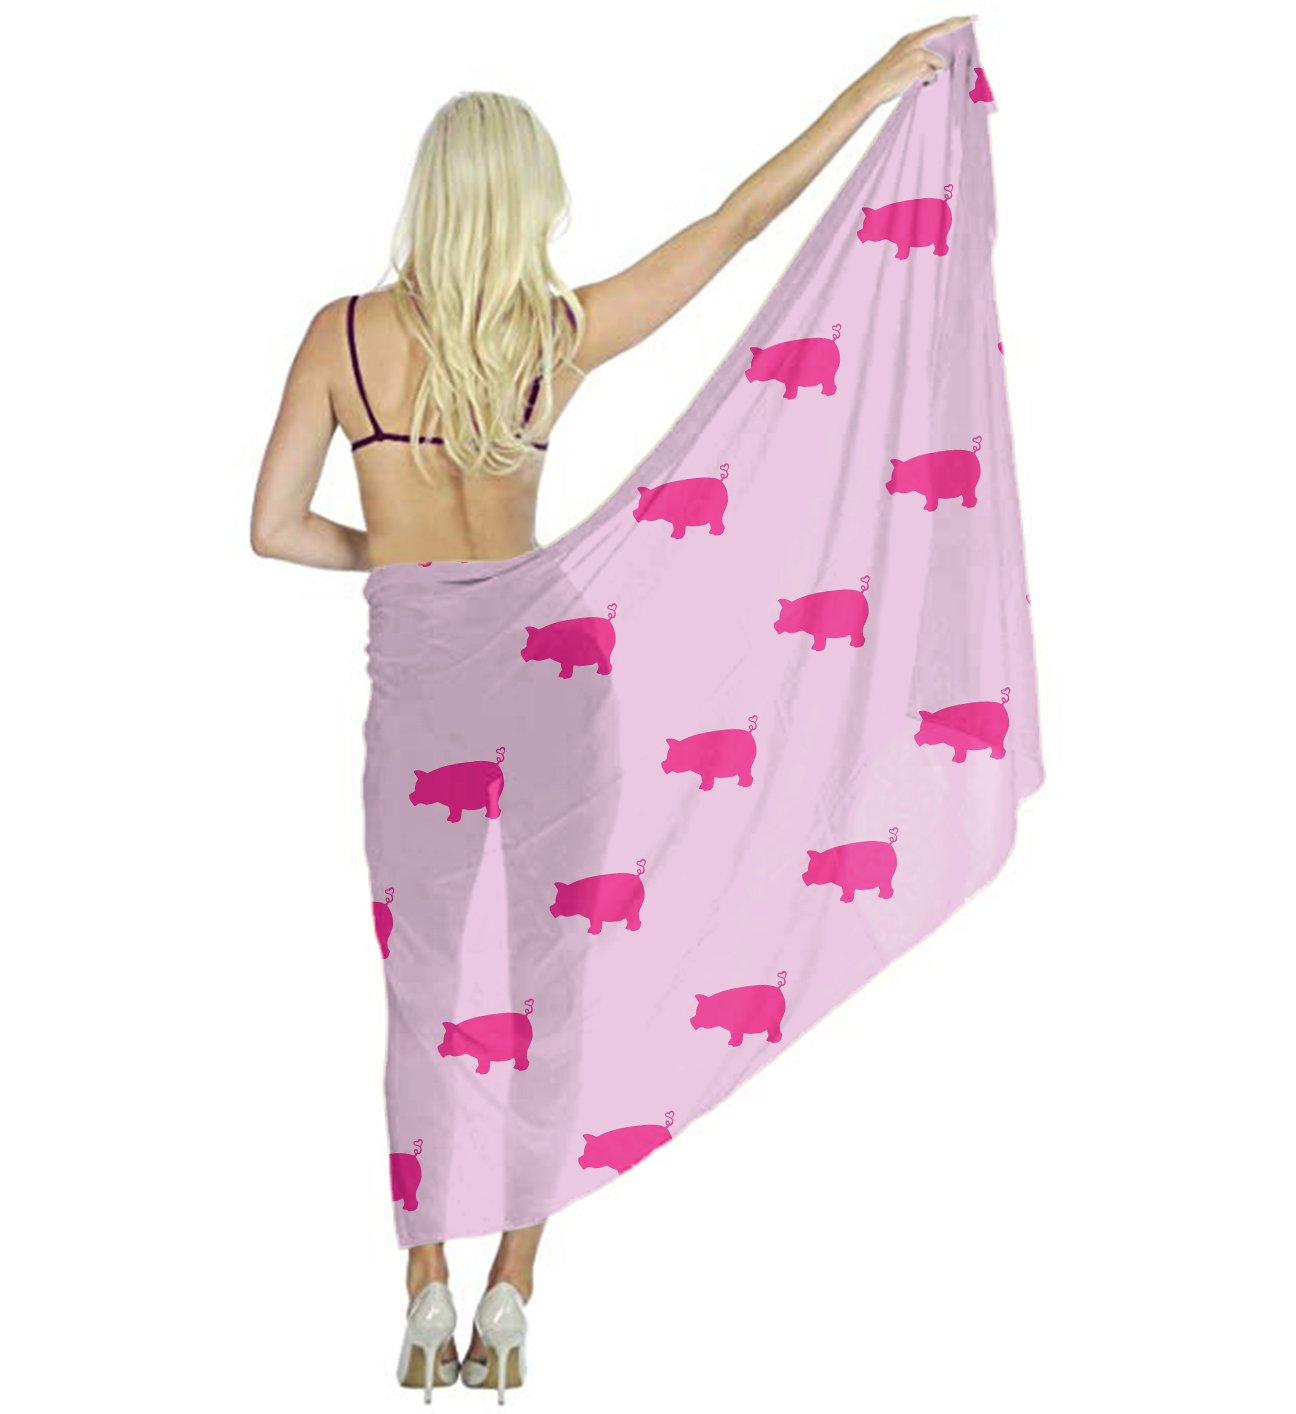 Fashion Women Silk Scarf - Pink Pigs Pattern - Bridal Evening Dress Soft Wrap Shawl